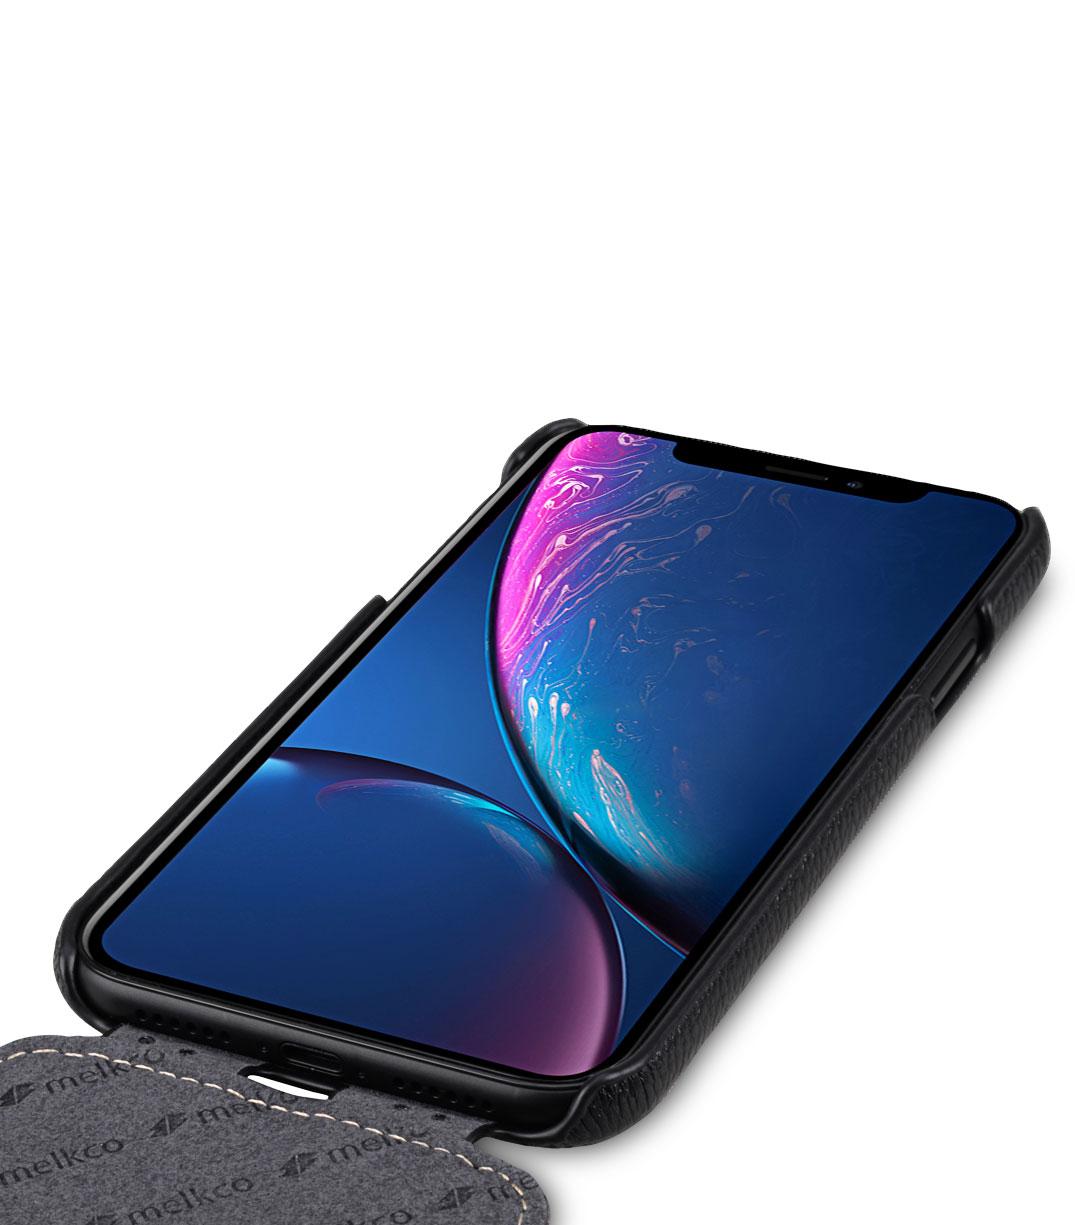 Melkco iPhone XR (6.1インチ) (2018) プレミアム レザーケース 本革 ハンドメイド 磁石不使用 フリップタイプ (縦開き) [ ラセス rasesu Inc 日本正規代理店品 ]  【 ブラックLC 】